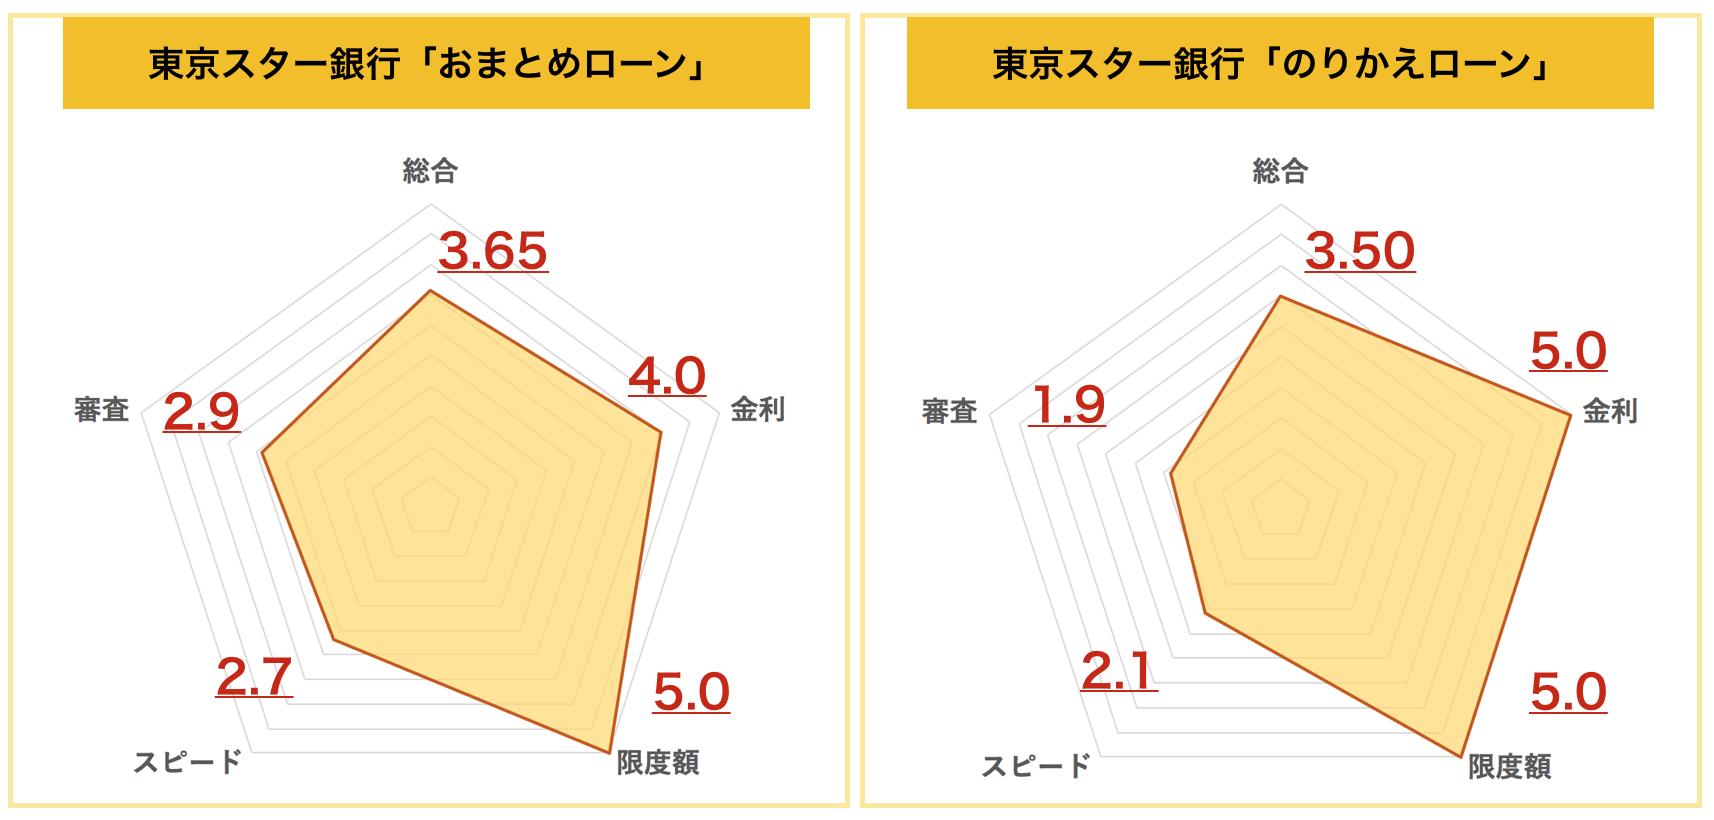 %e3%82%b9%e3%82%af%e3%83%aa%e3%83%bc%e3%83%b3%e3%82%b7%e3%83%a7%e3%83%83%e3%83%88-2016-12-25-17-41-56